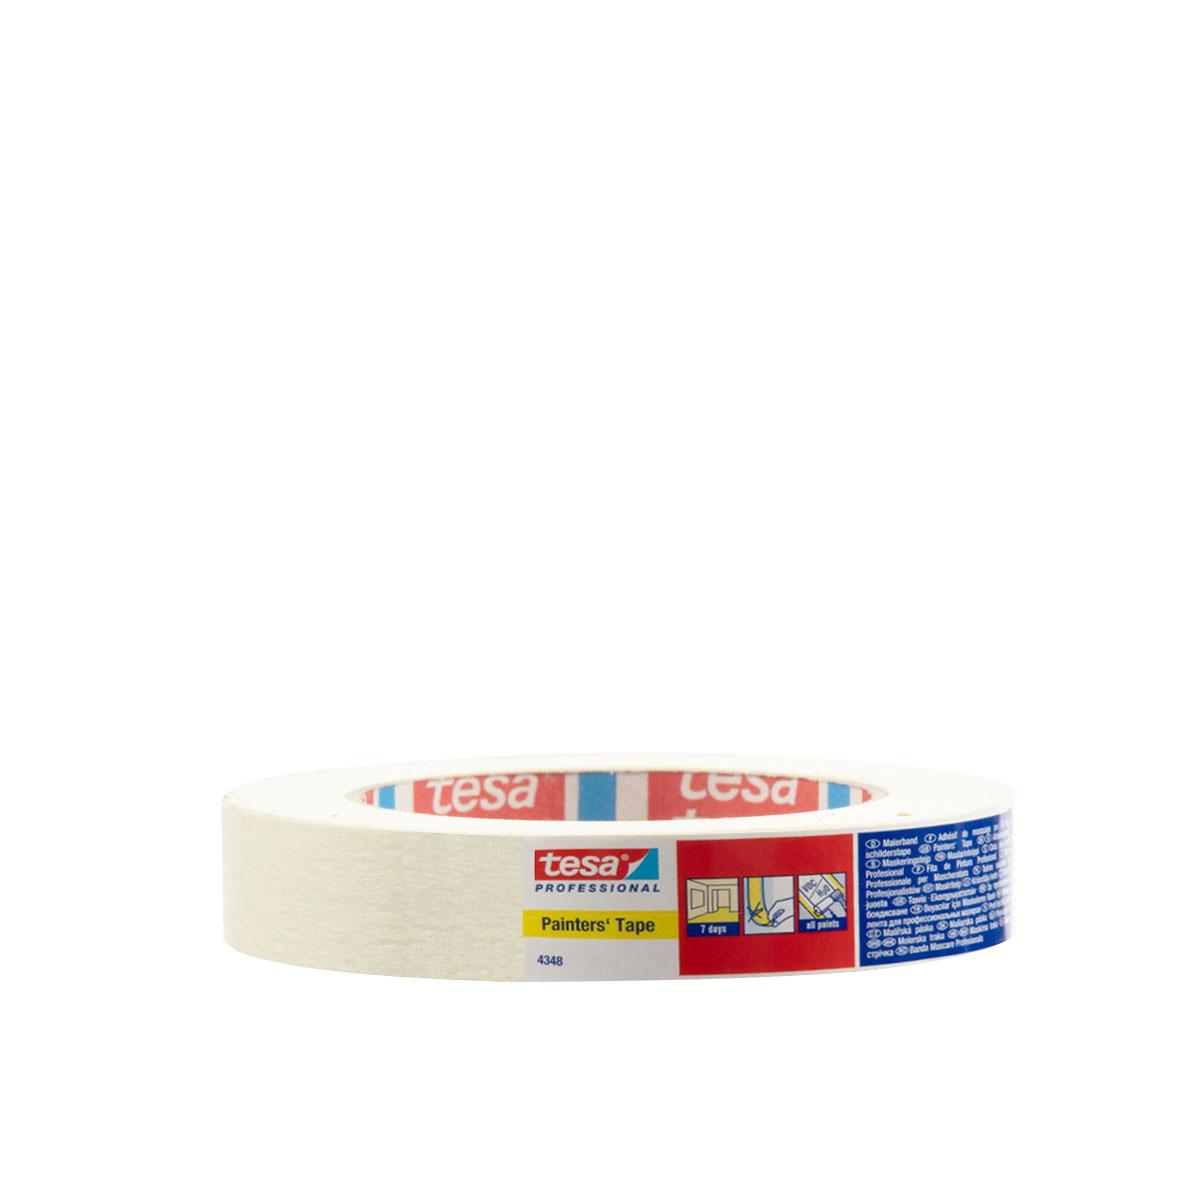 Tesa 4348 Malerkrepp 19 mm Malerband